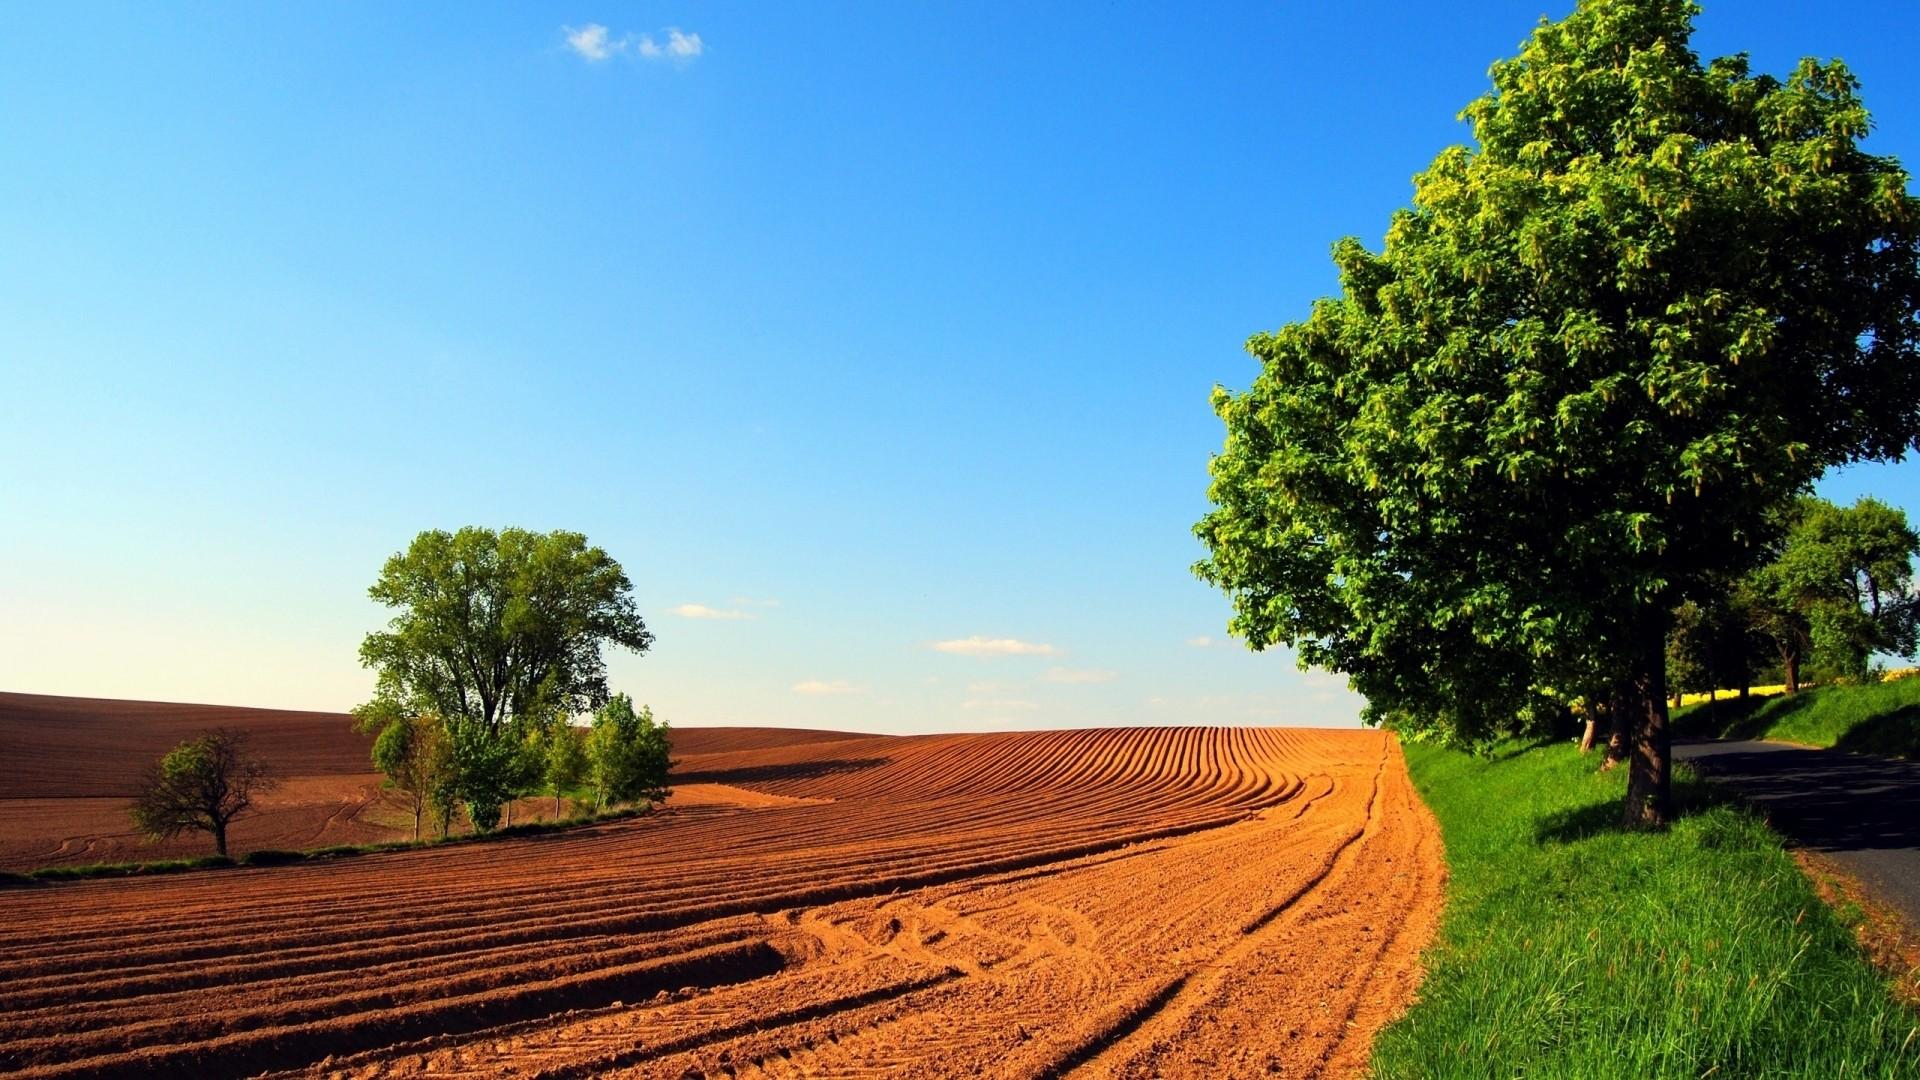 Wallpaper arable land, field, trees, summer